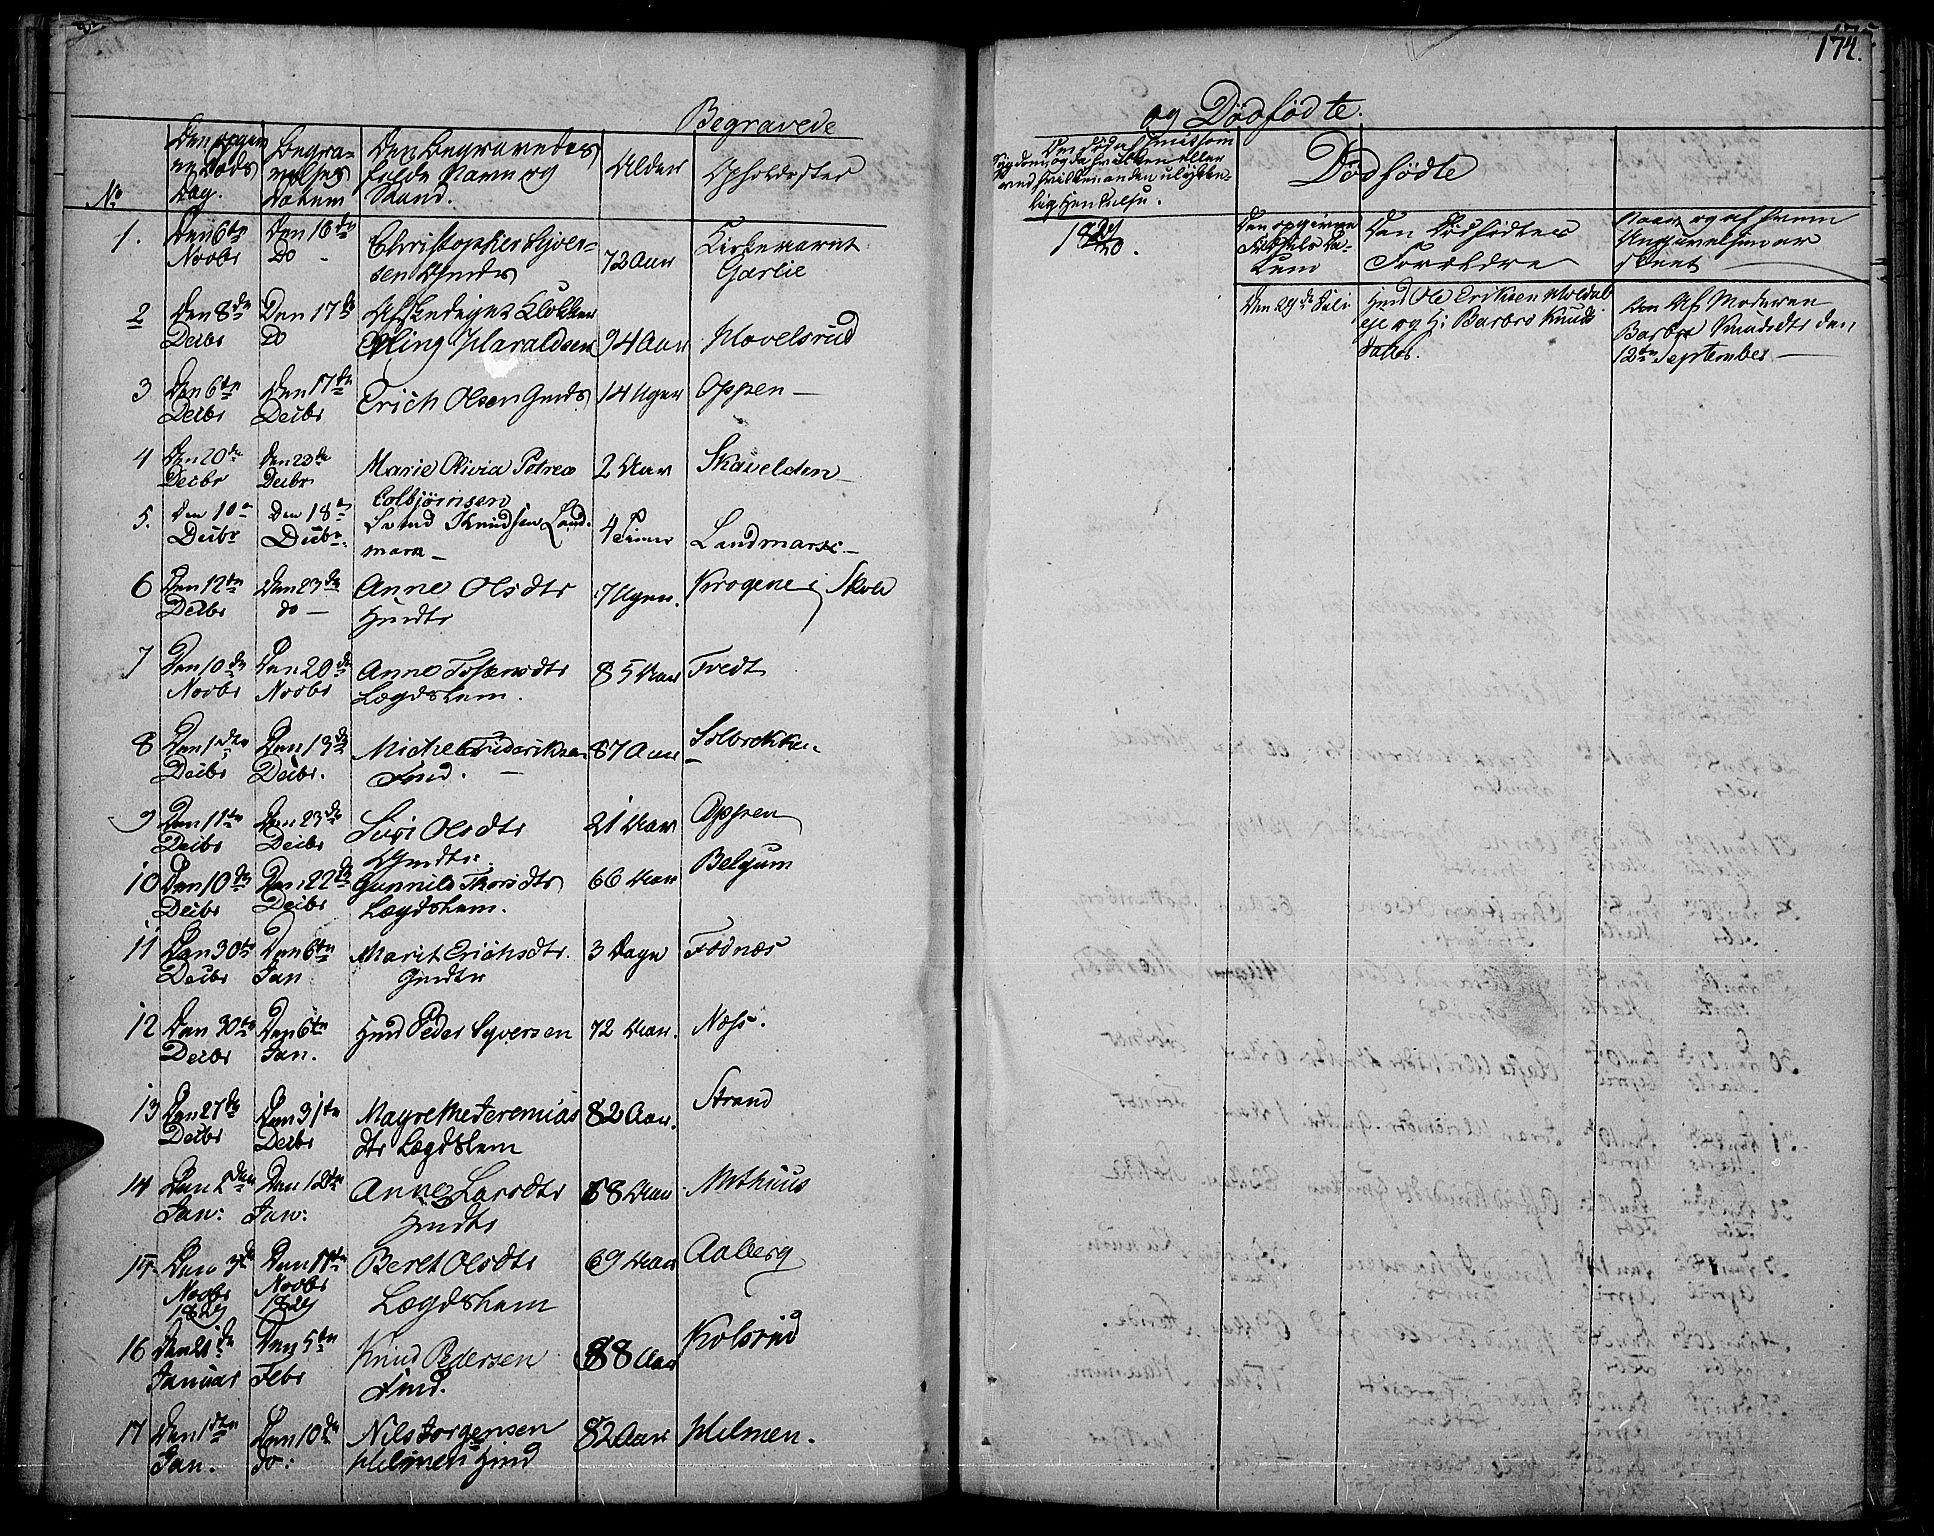 SAH, Nord-Aurdal prestekontor, Ministerialbok nr. 3, 1828-1841, s. 174